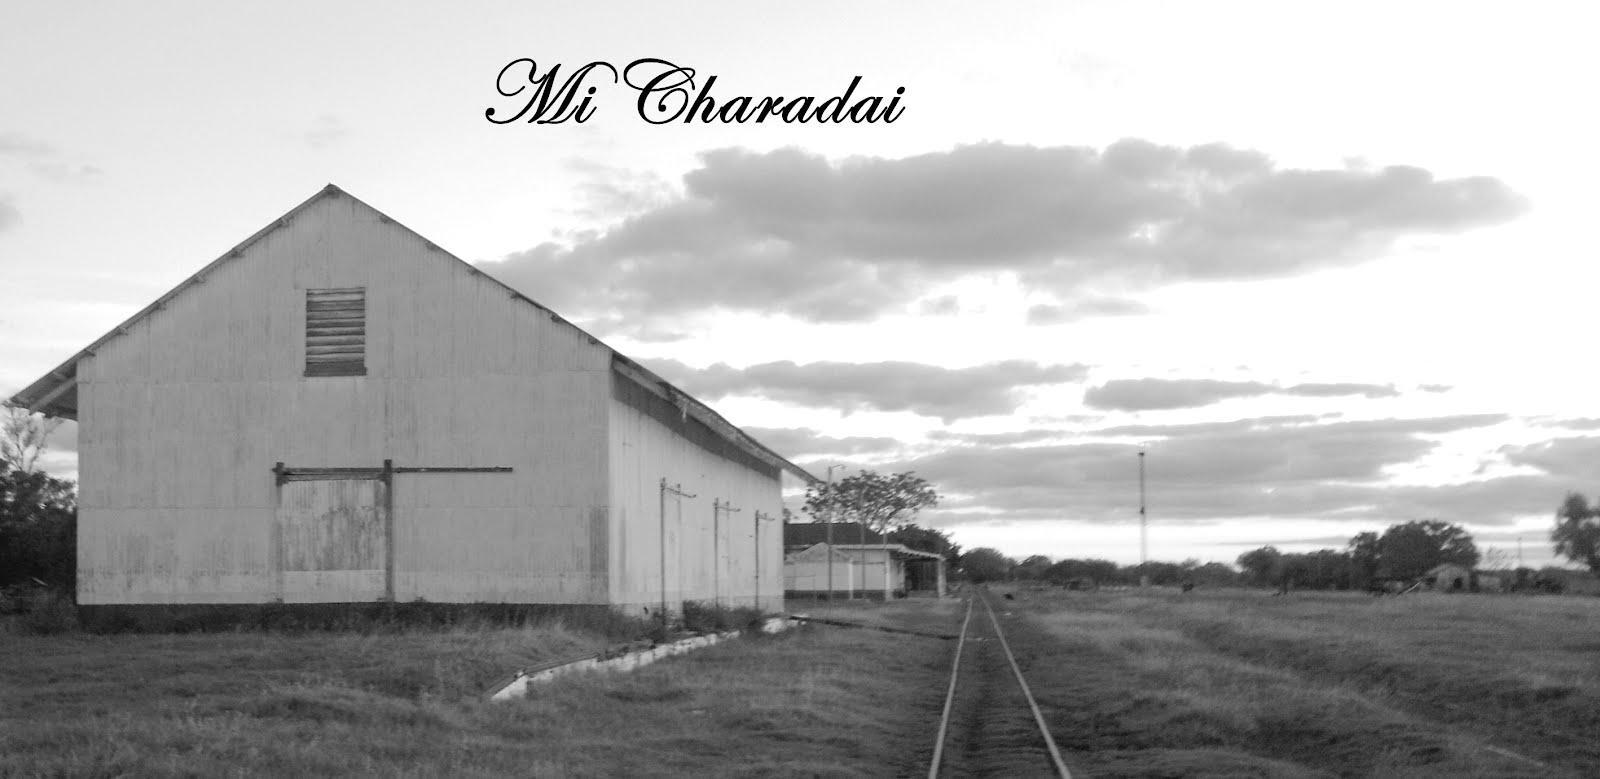 Mi Charadai